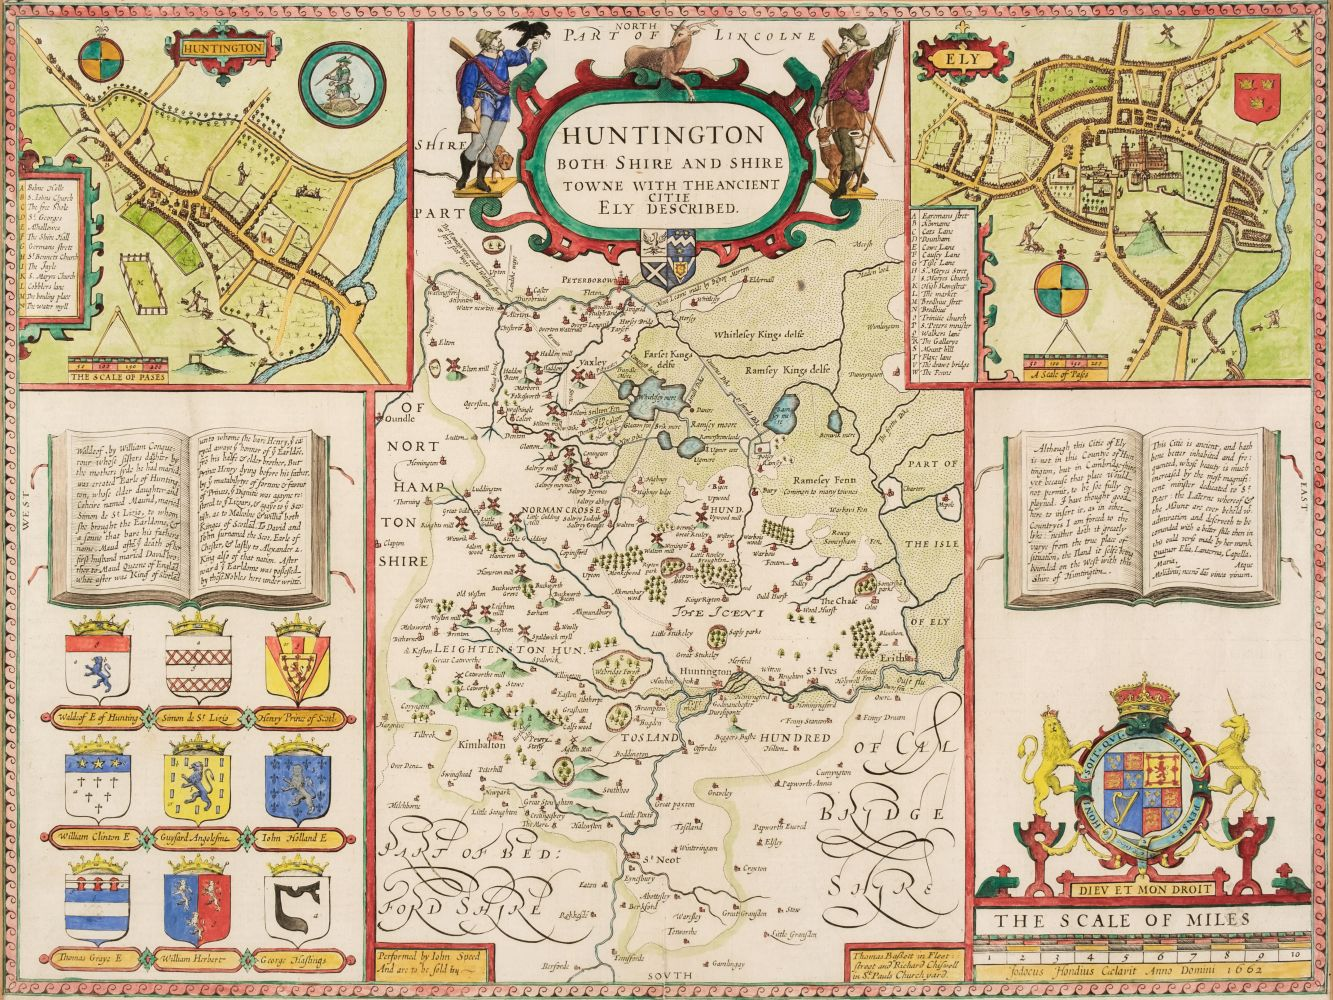 * Huntingdonshire. Speed (John), Huntingdon both Shire and Shire Towne..., 1676